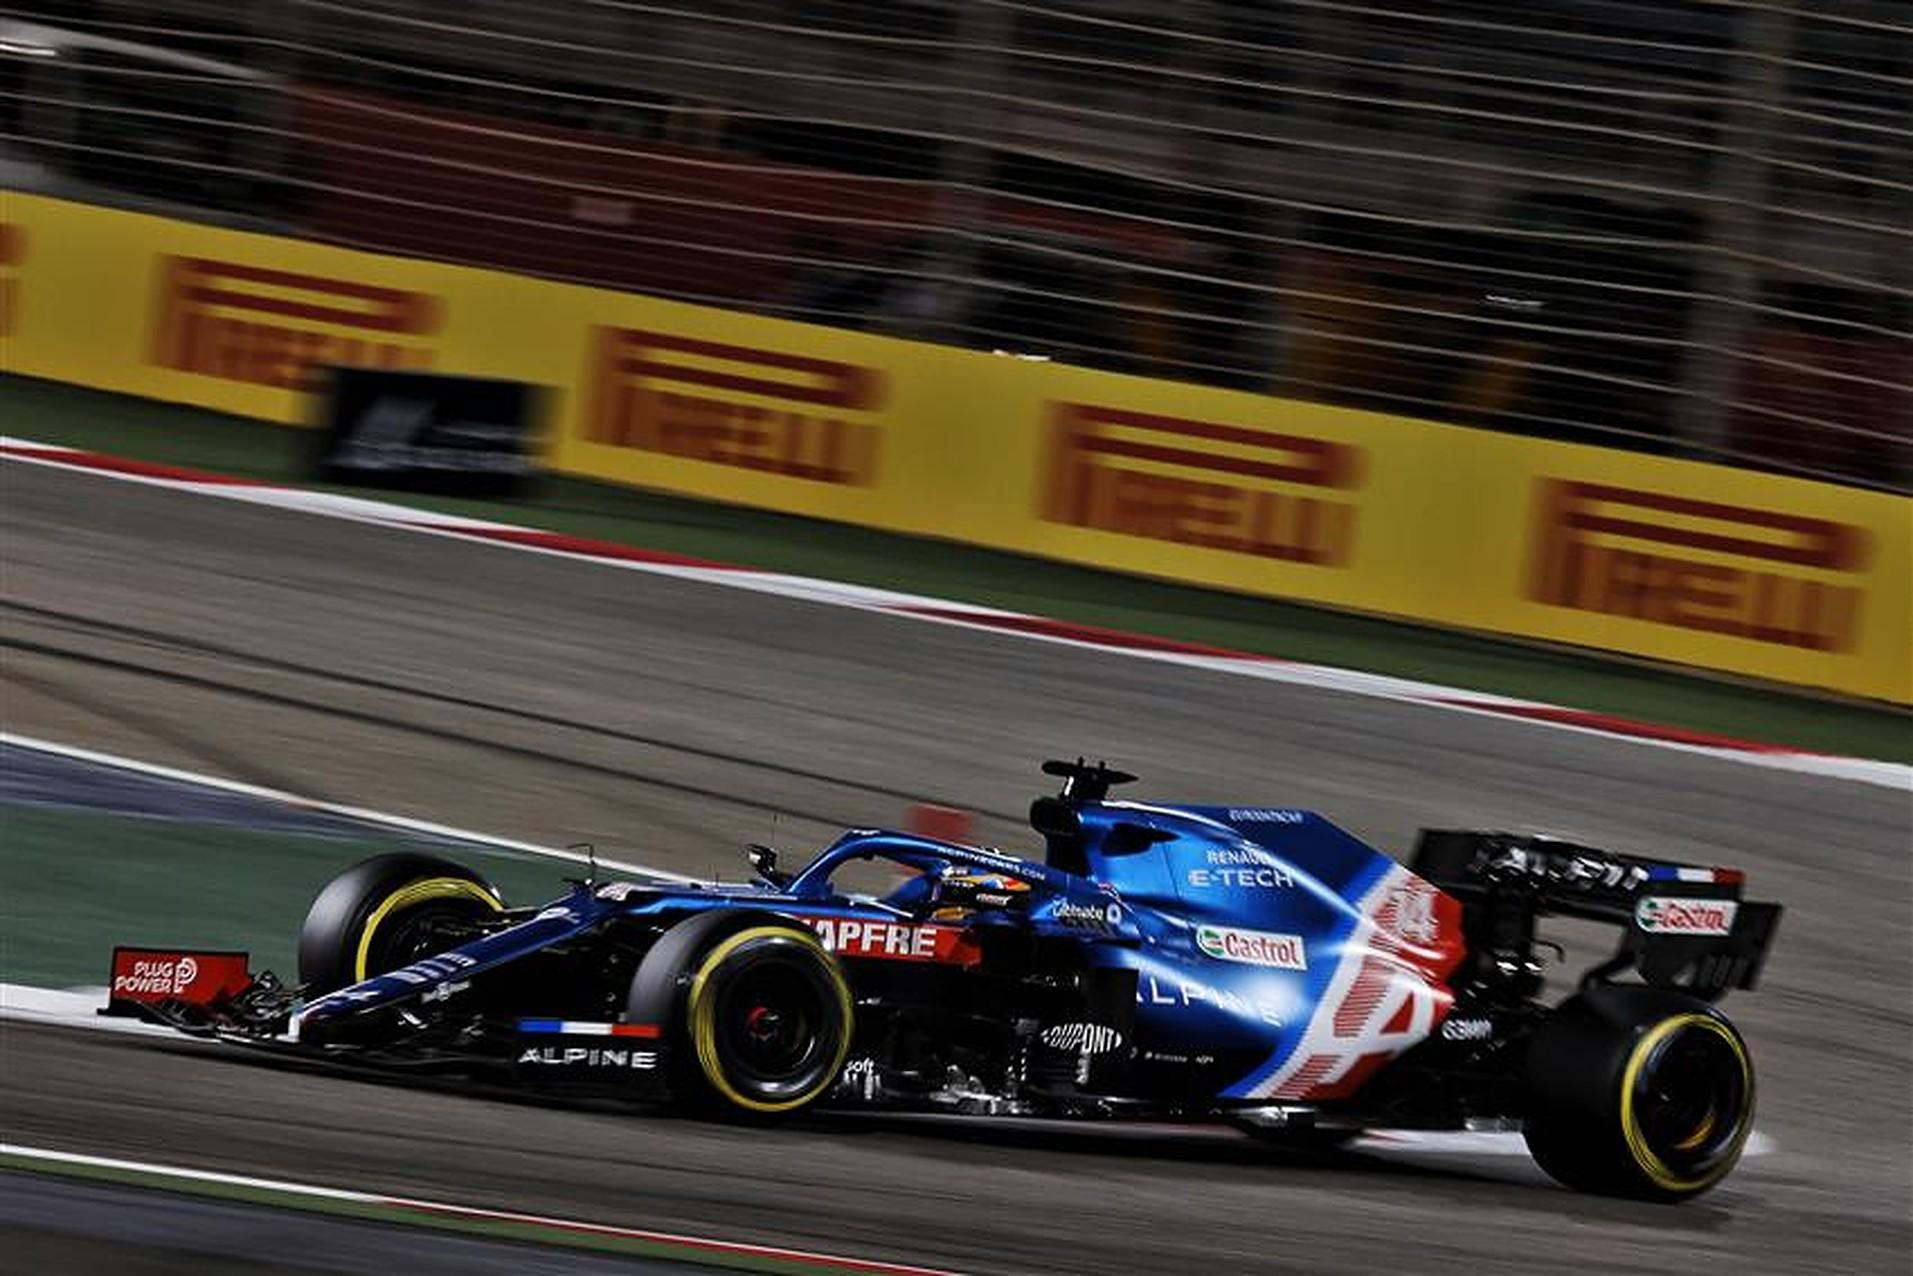 Fernando Alonso at 2021 Bahrain GP in Alpine car - Formula1news.co.uk